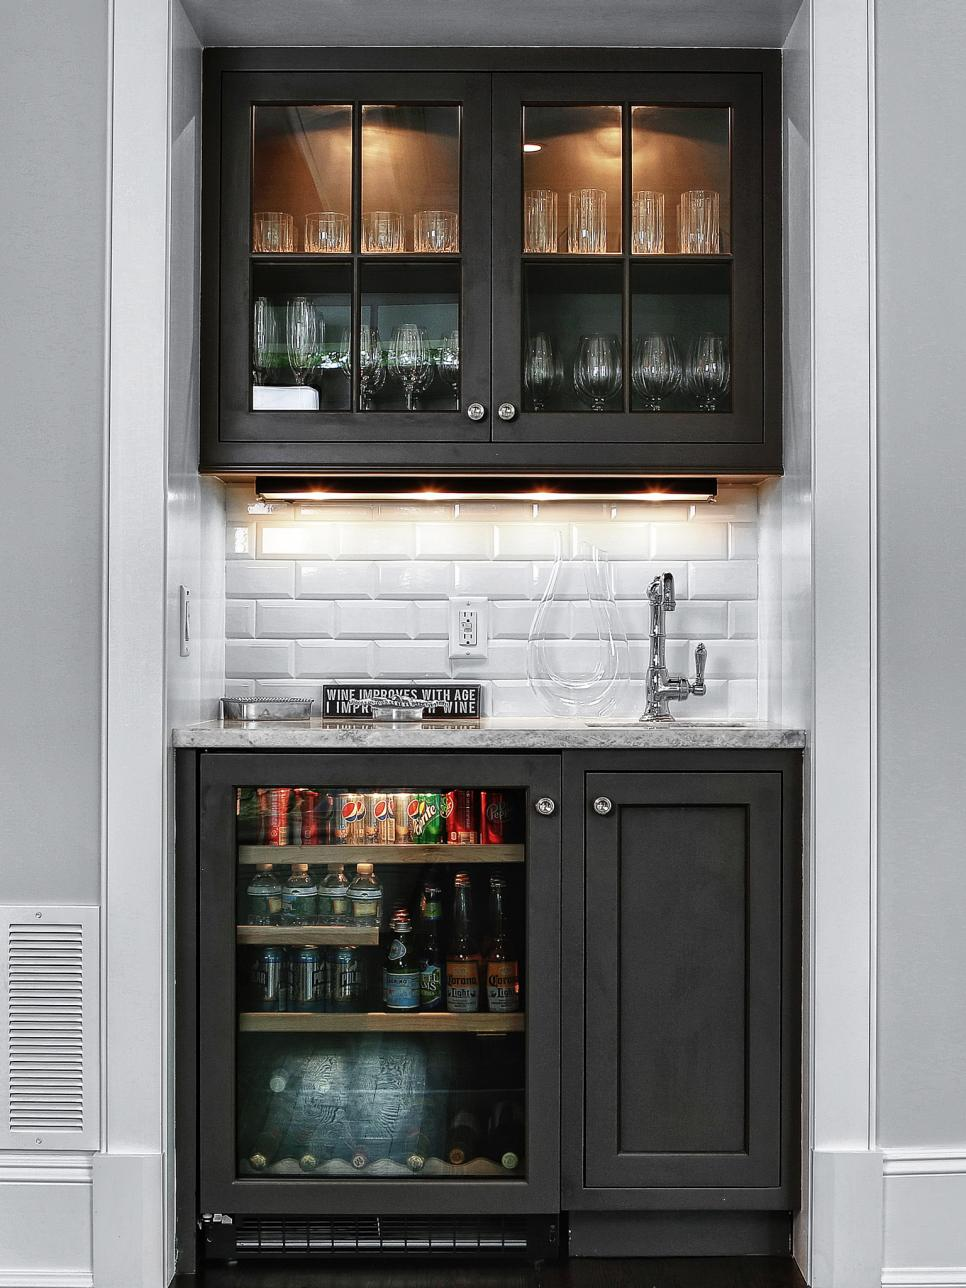 you can squeeze a home bar in an akward niche